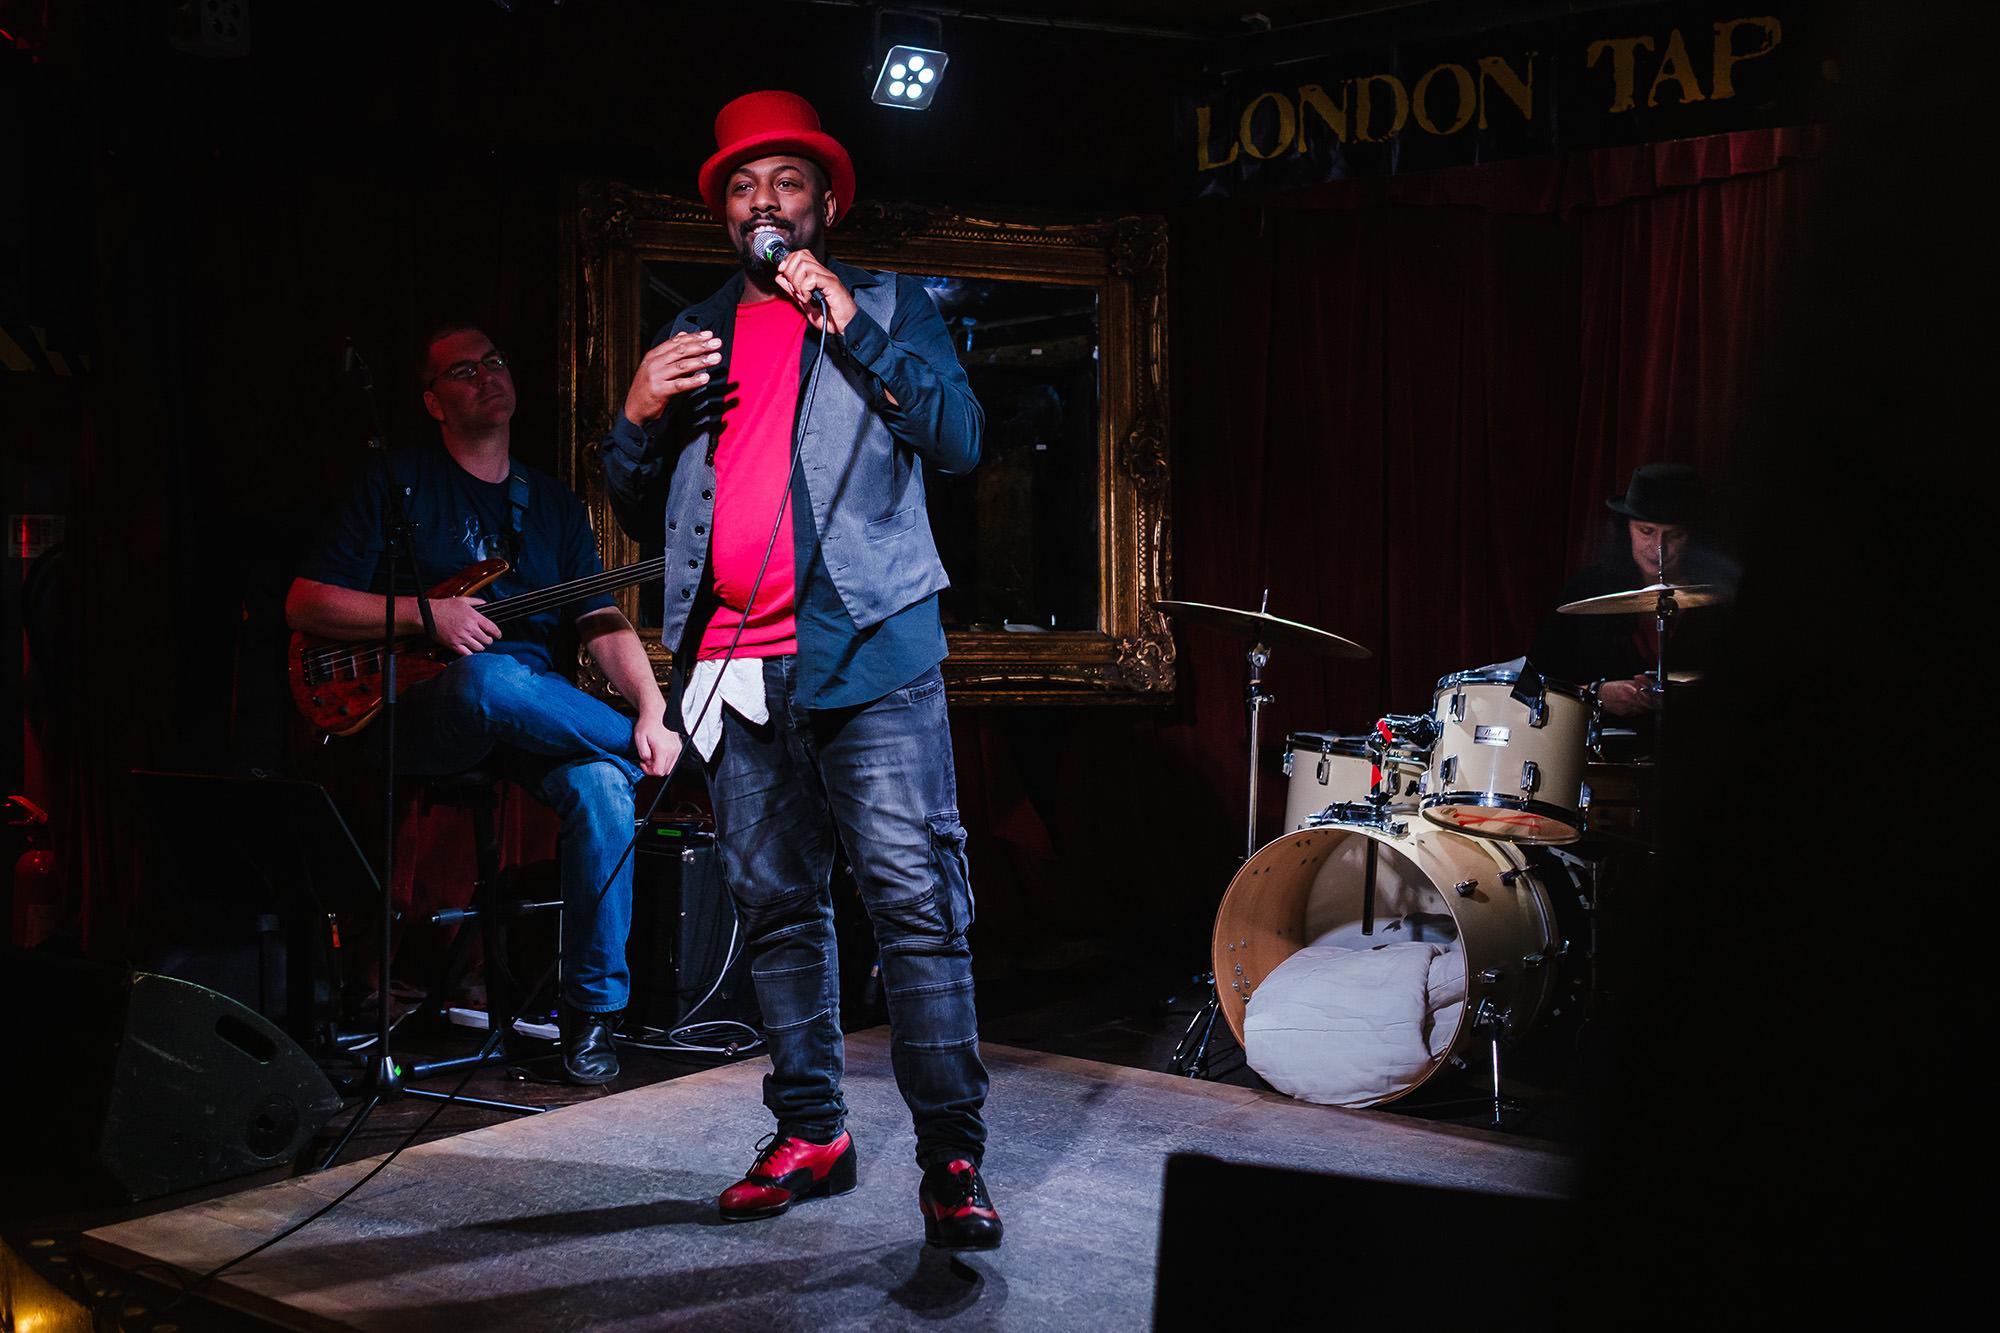 London Tap Jam host Lee Payne